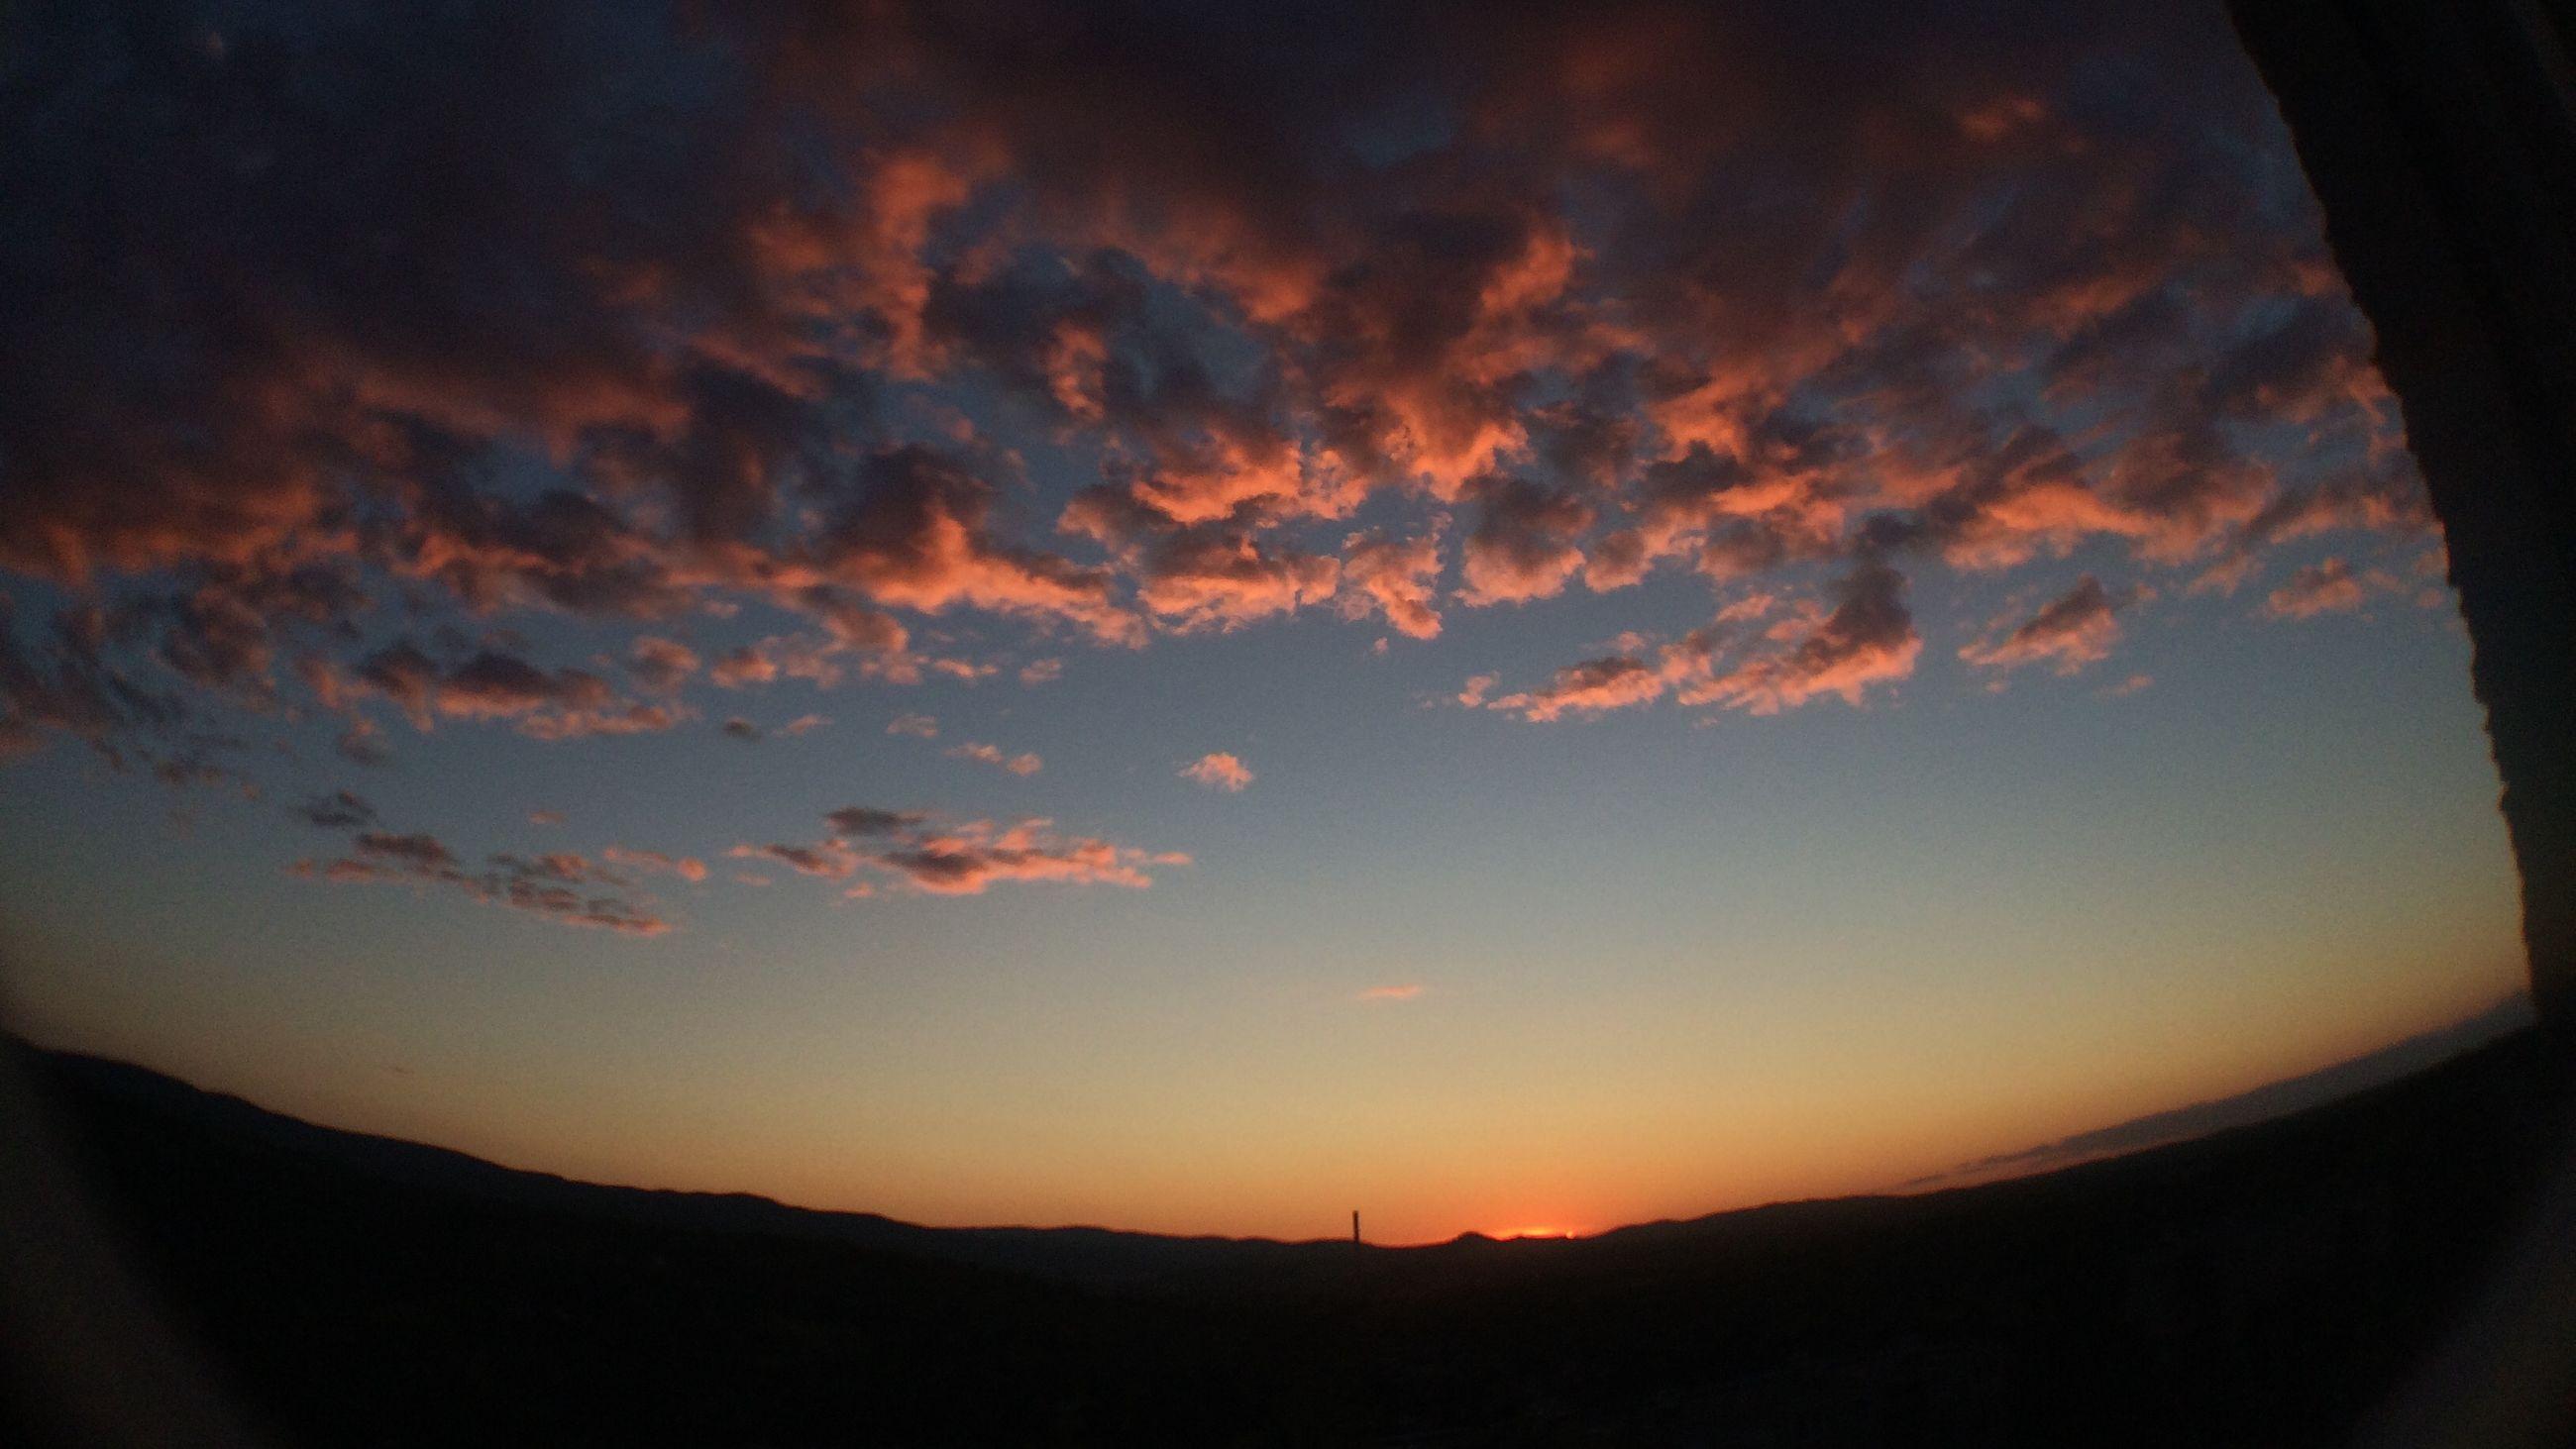 sunset, sky, scenics, silhouette, tranquil scene, beauty in nature, tranquility, cloud - sky, orange color, nature, idyllic, cloud, landscape, mountain, dramatic sky, majestic, dark, cloudy, dusk, cloudscape